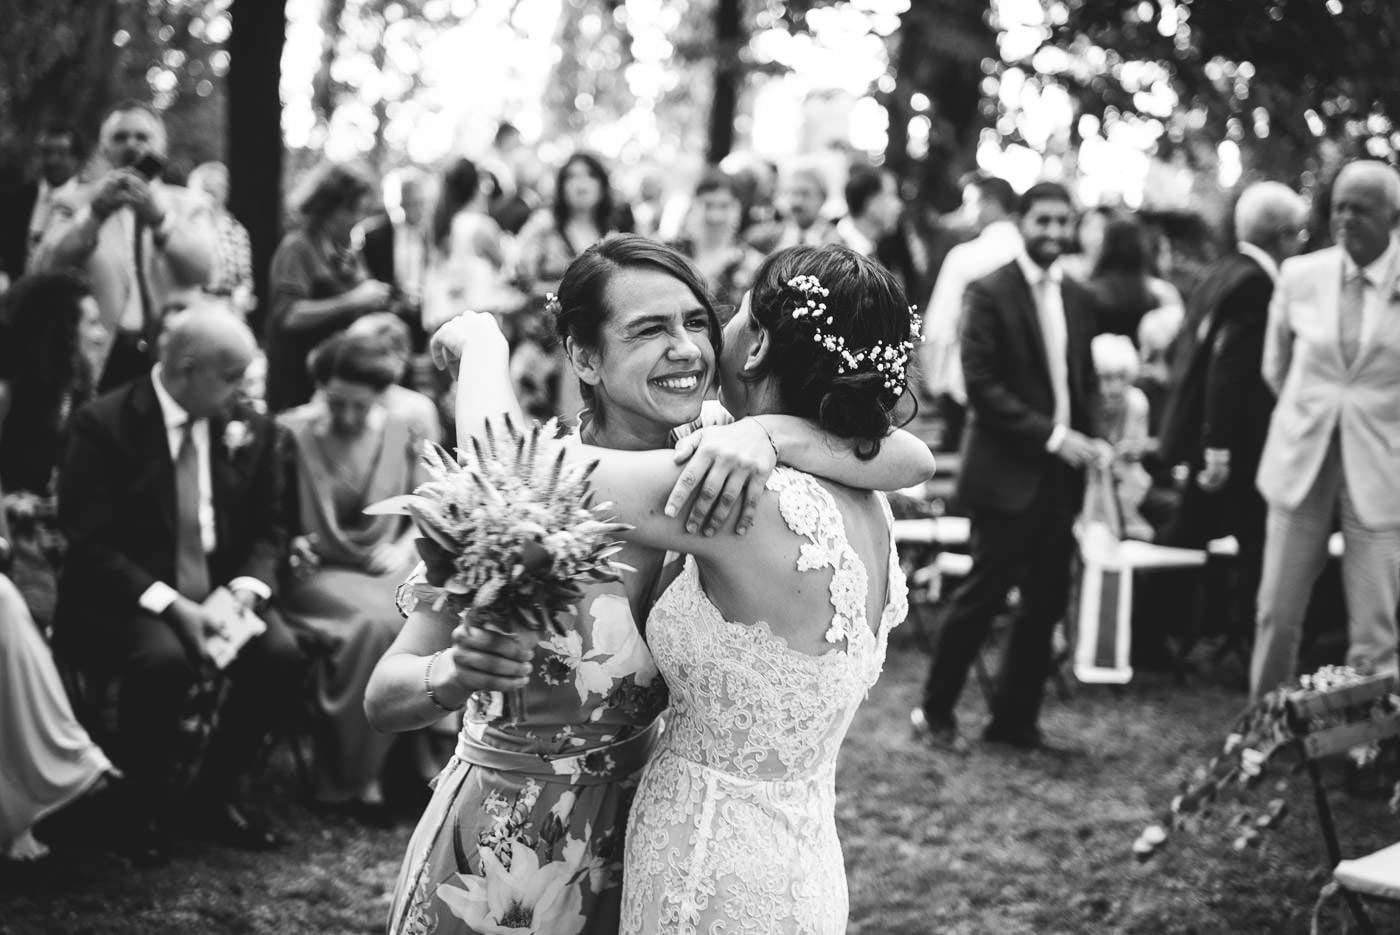 Matrimonio Giulia & Federico 09_15 – Alessio Nobili Photographer-35